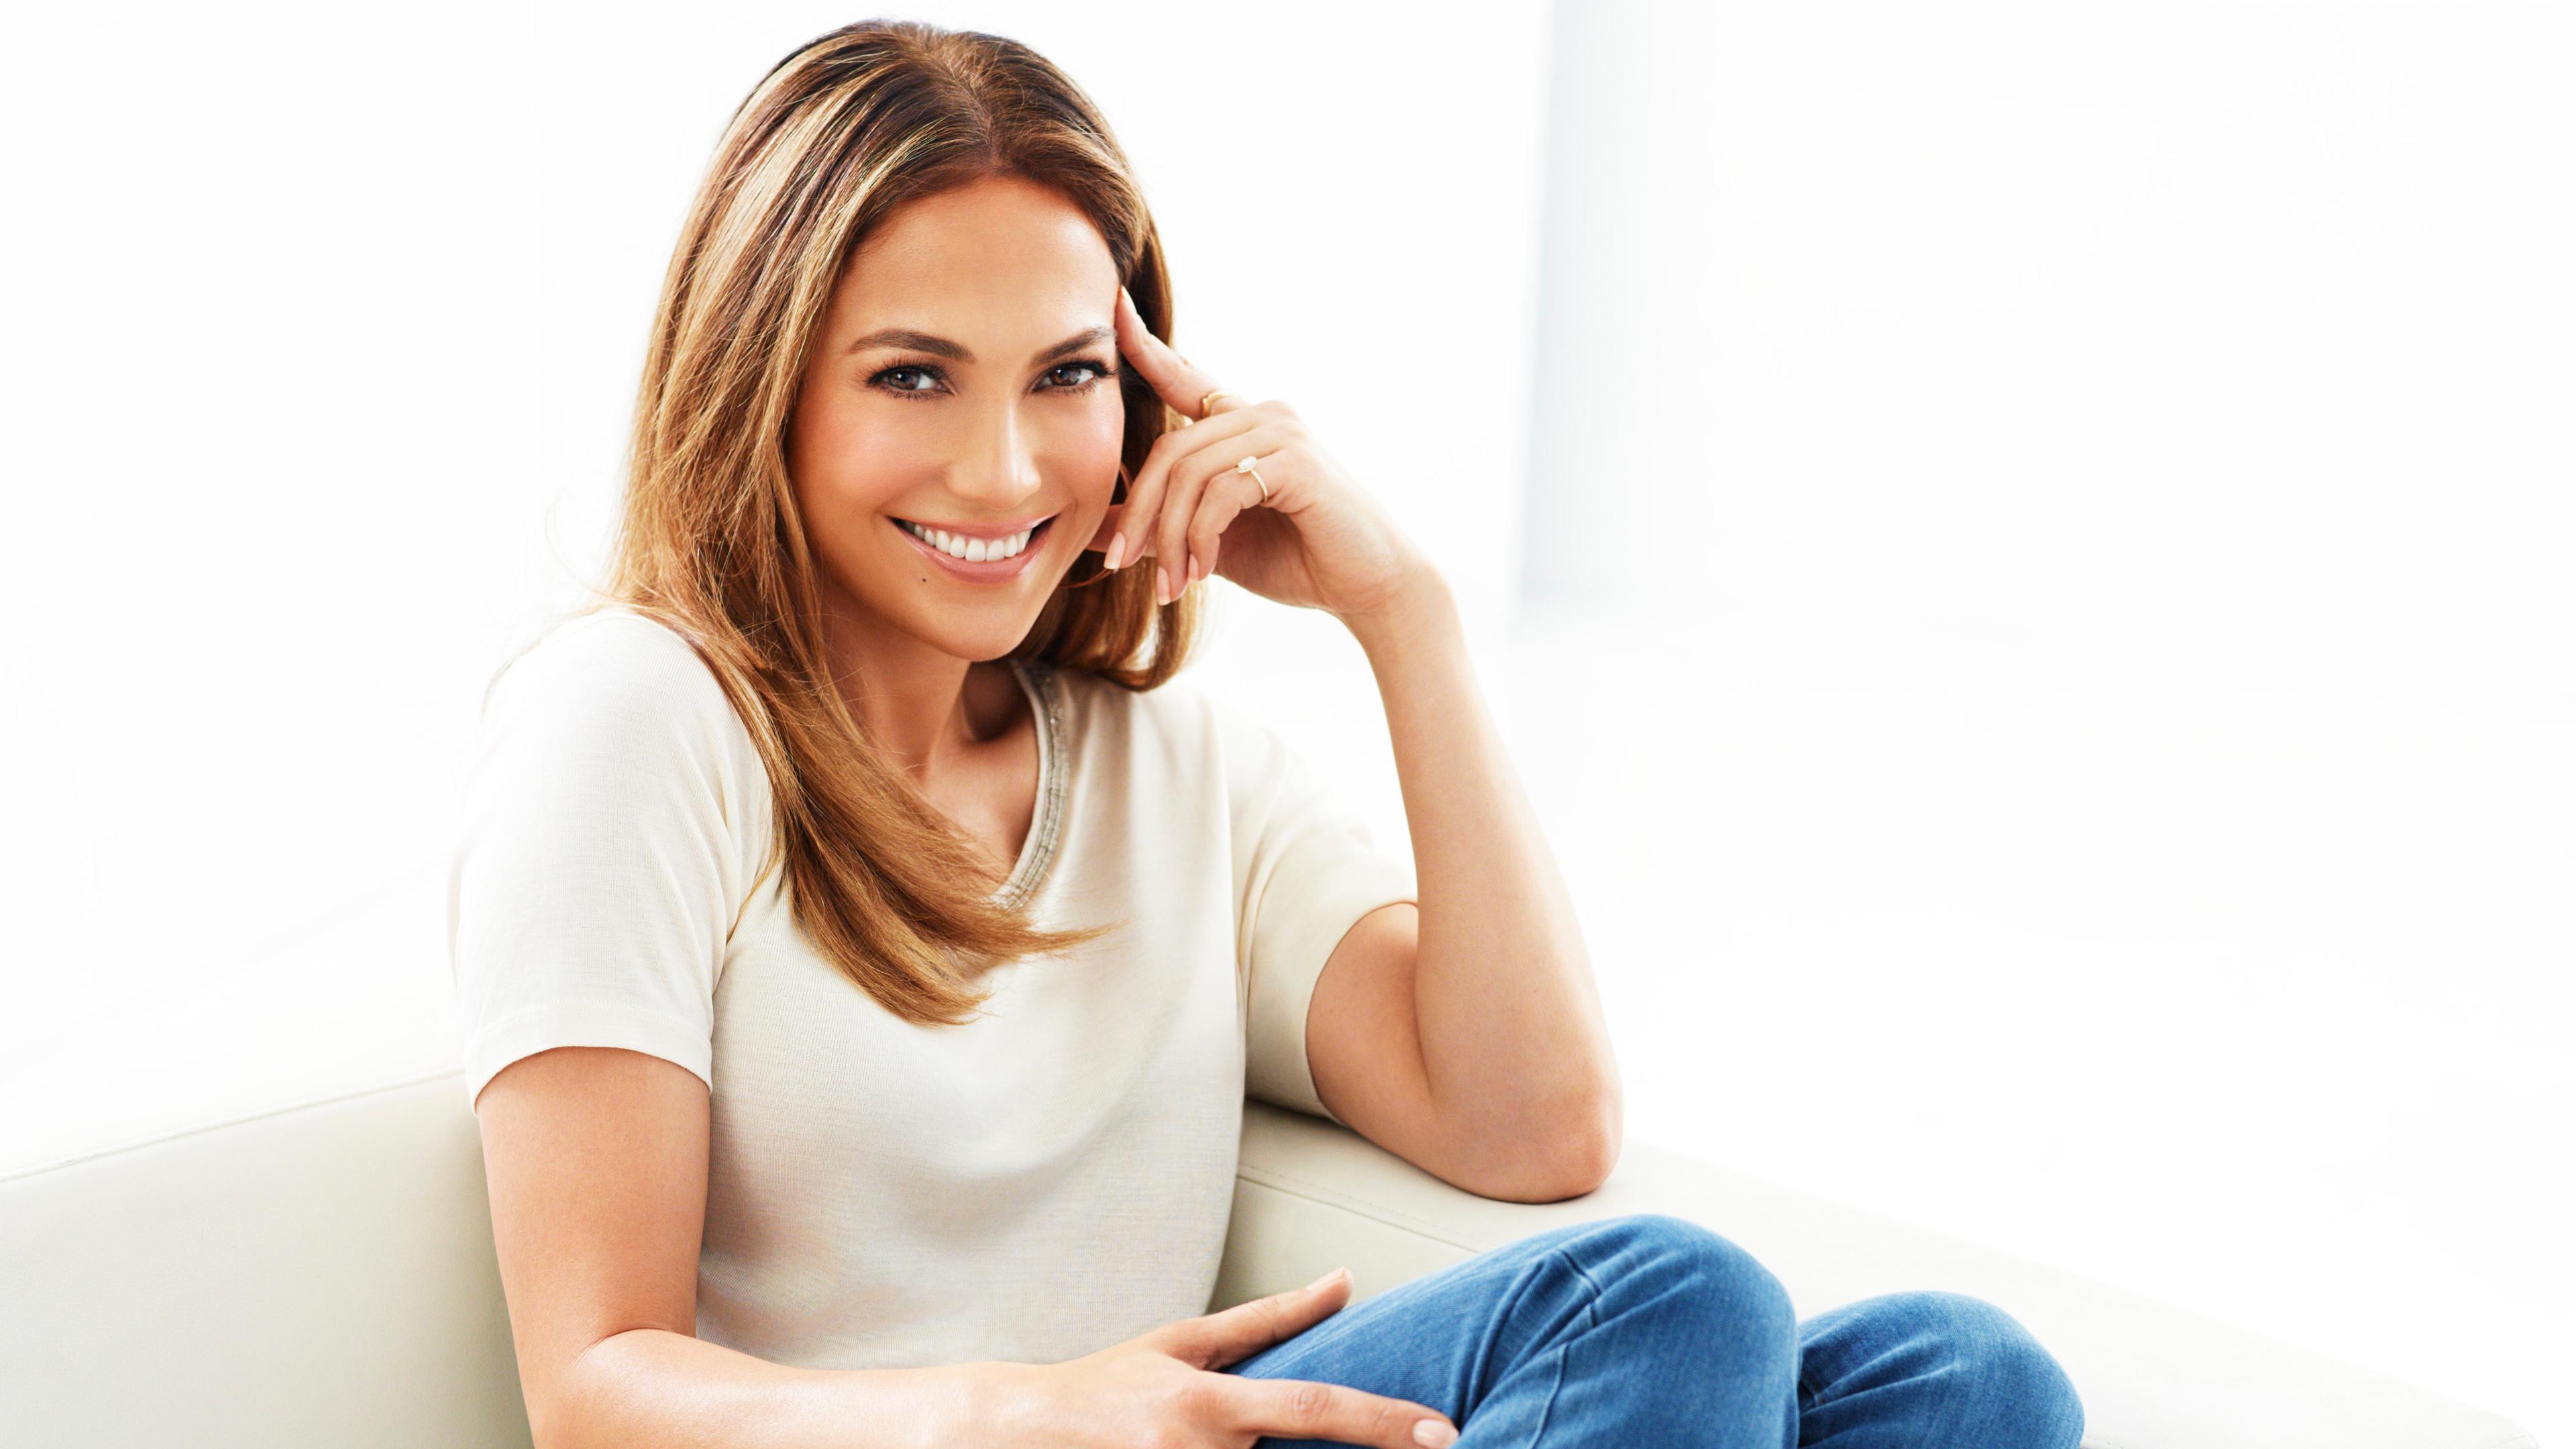 jennifer lopez smiling 2018 1542824644 - Jennifer Lopez Smiling 2019 - smile wallpapers, singer wallpapers, music wallpapers, jennifer lopez wallpapers, hd-wallpapers, girls wallpapers, celebrities wallpapers, 4k-wallpapers